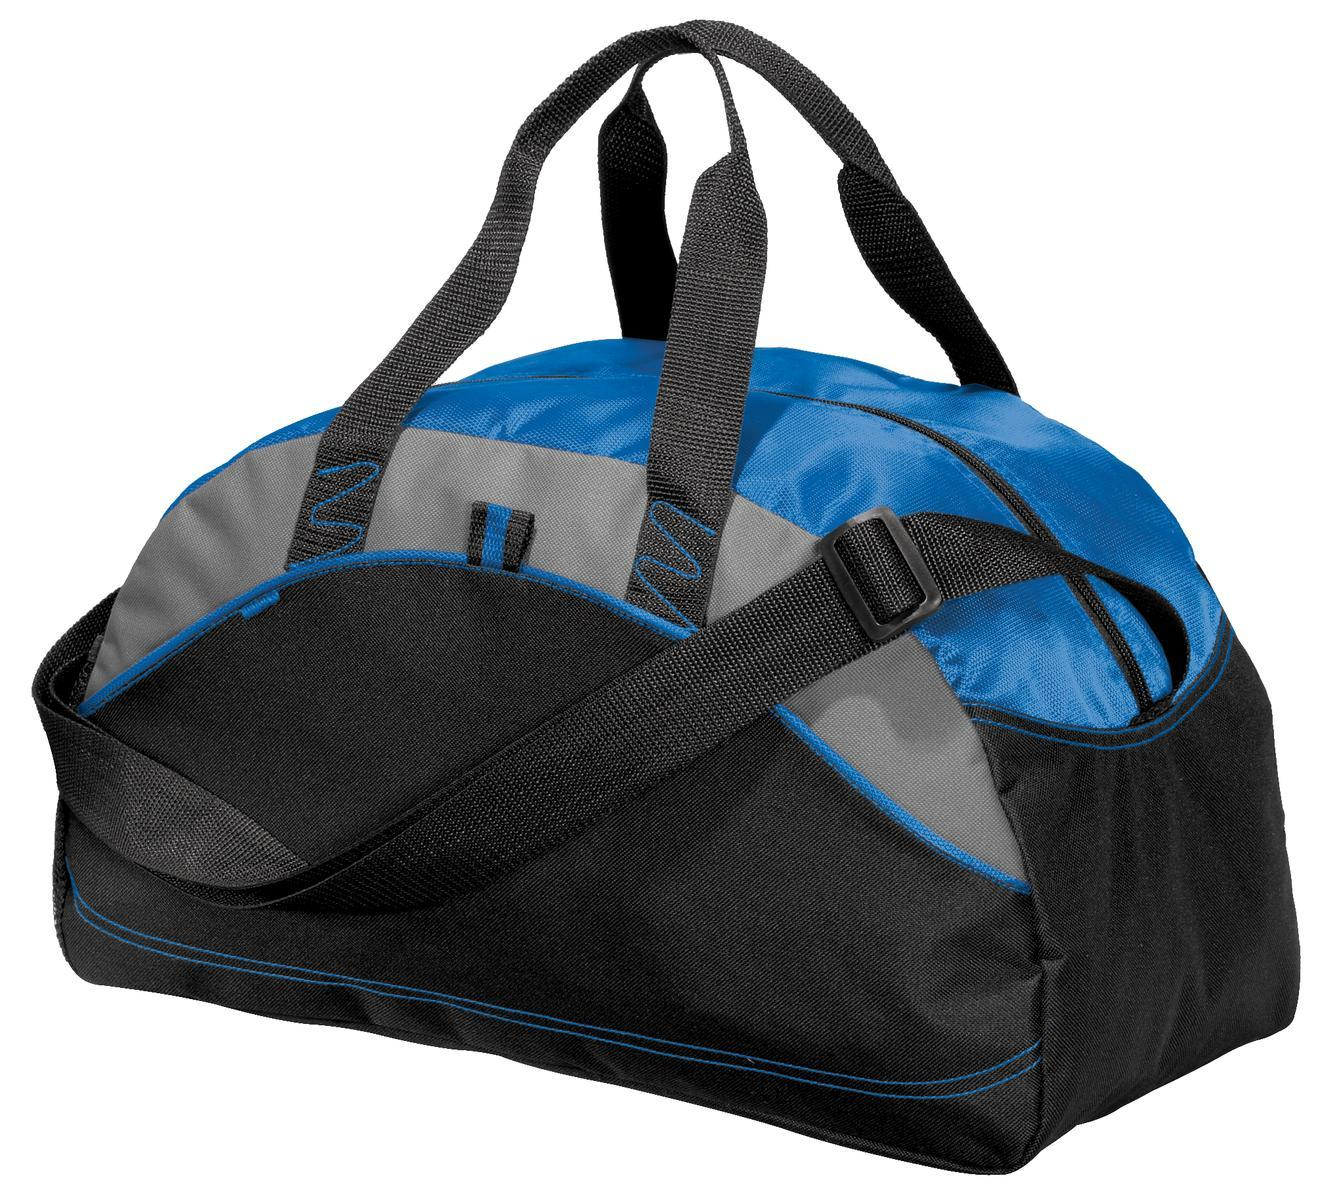 Port /& Company Zippered Polyester Padded Handle Sport Duffel Bag BG990S